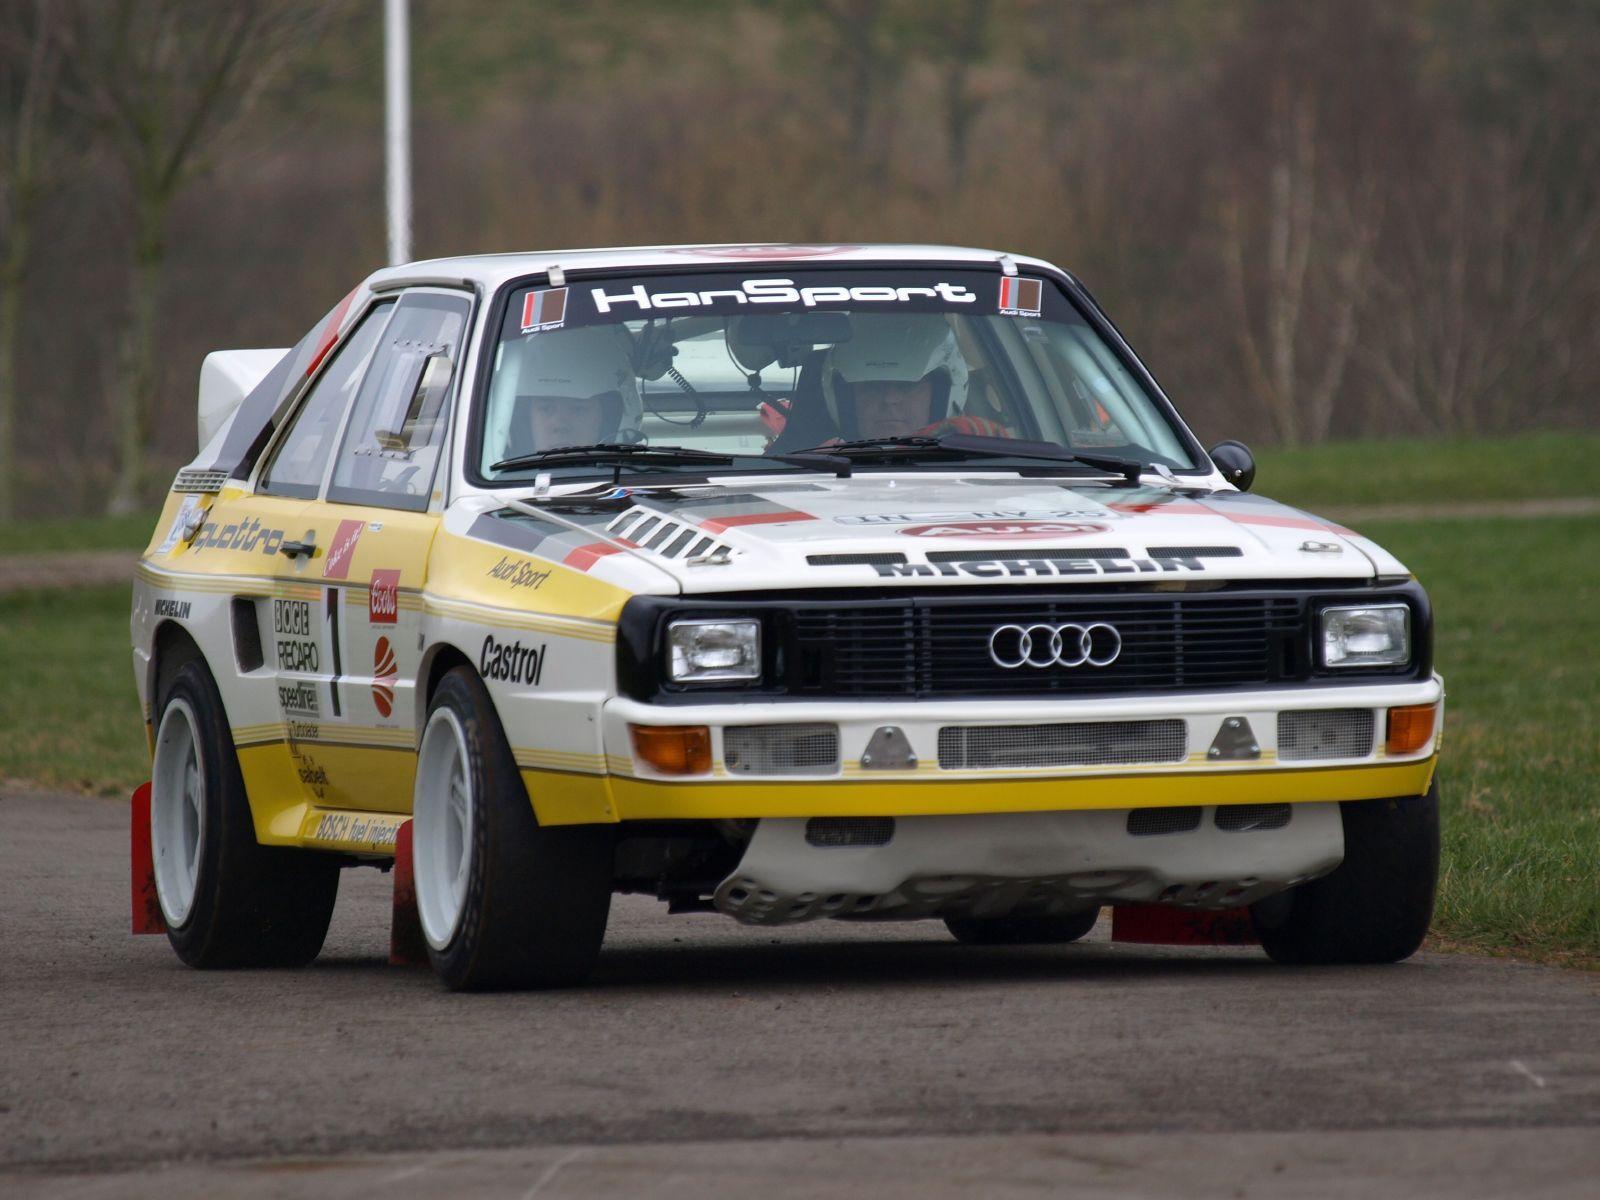 Audi Sport Quattro I appreciate all sorts of professional sports and ...